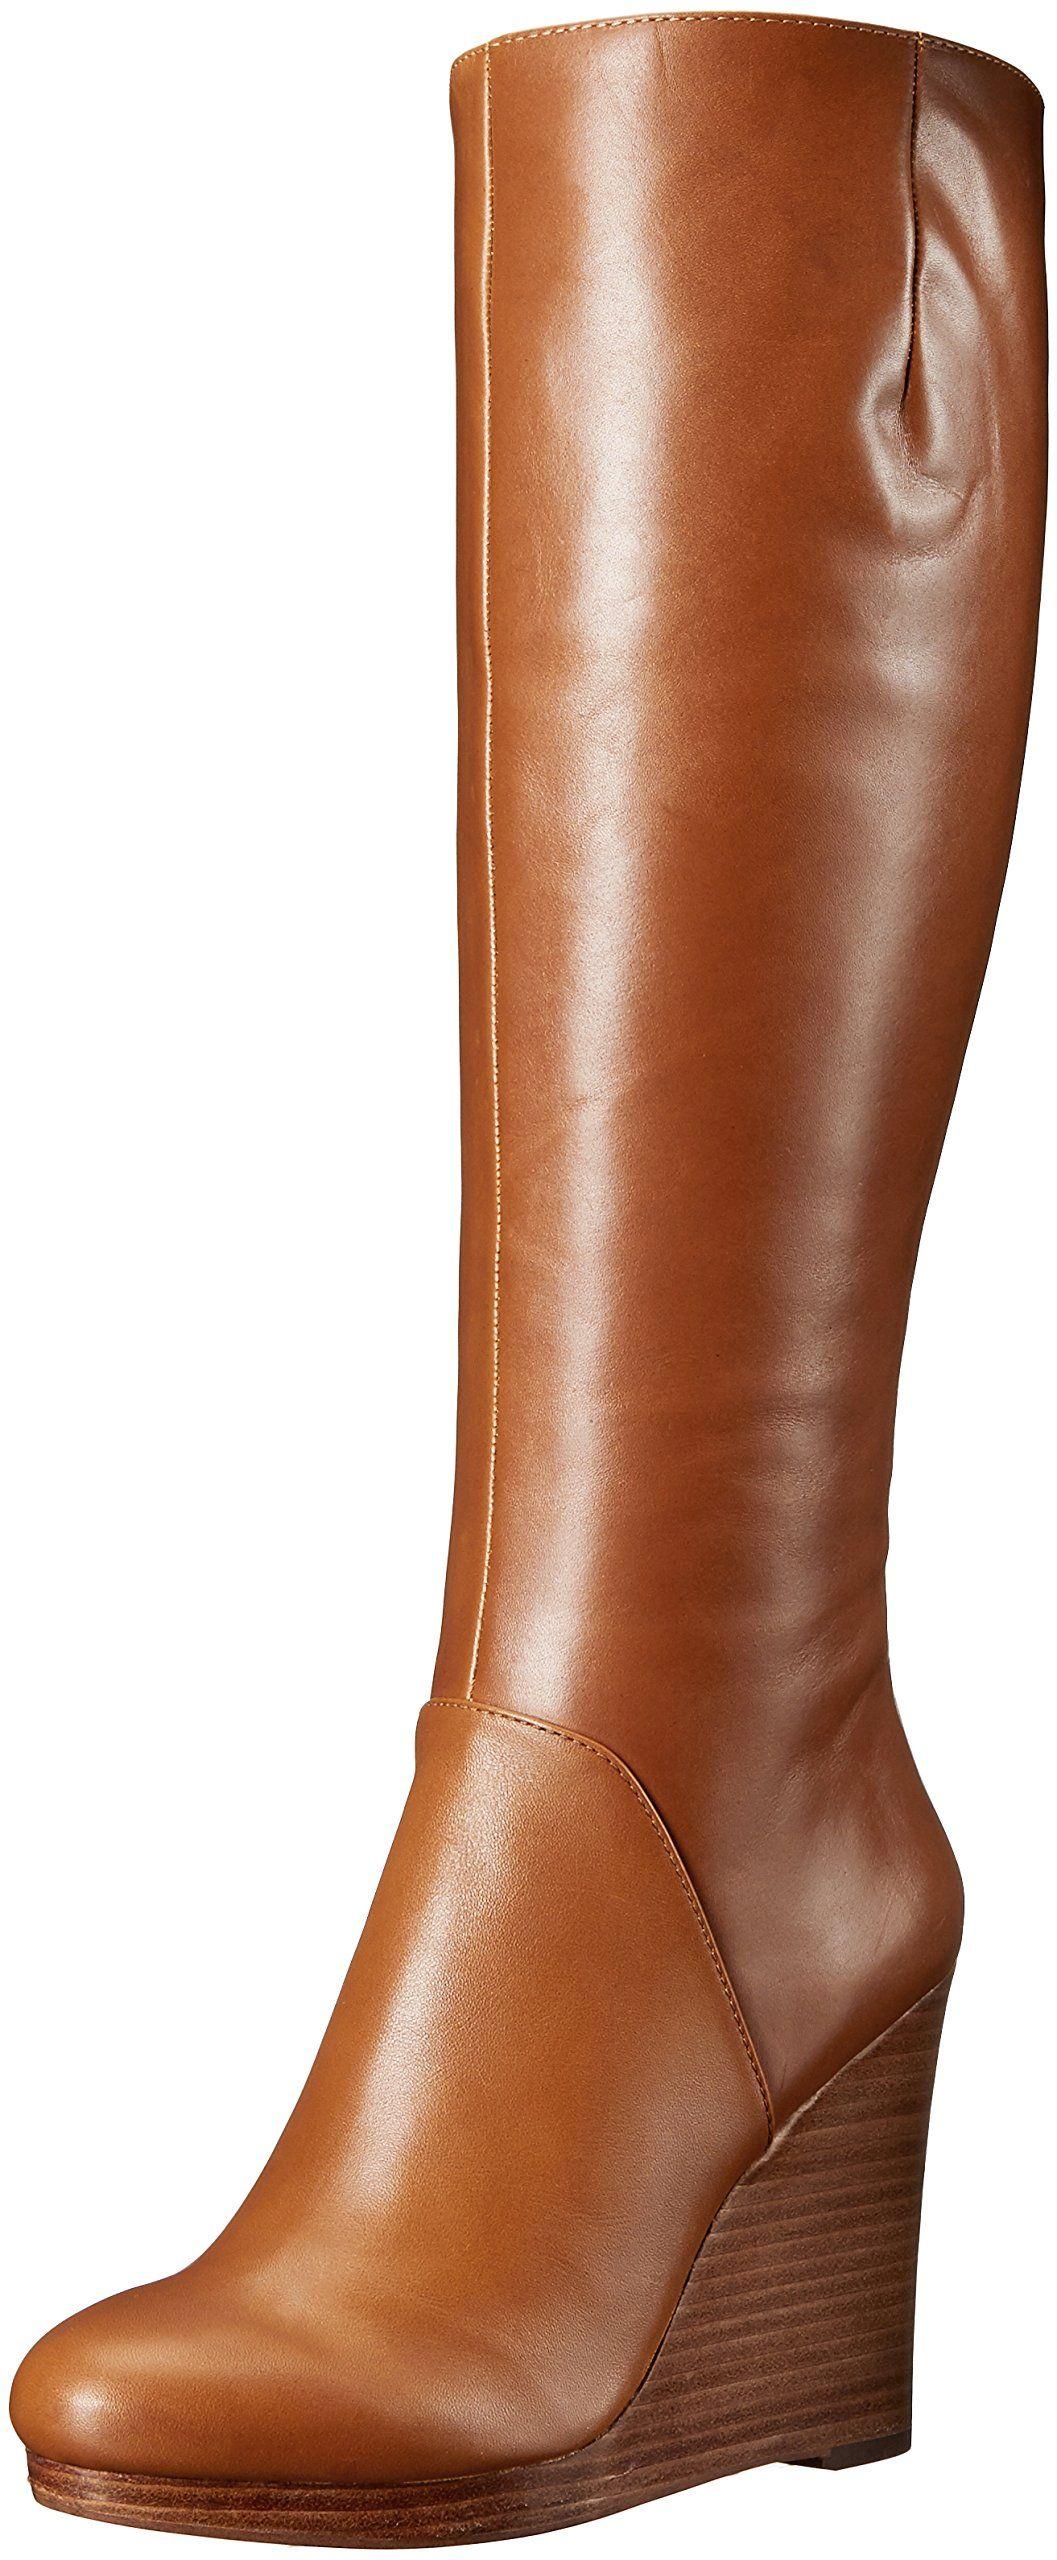 ca36f4c05a7 Nine West Women s Harvee Leather Winter Boot